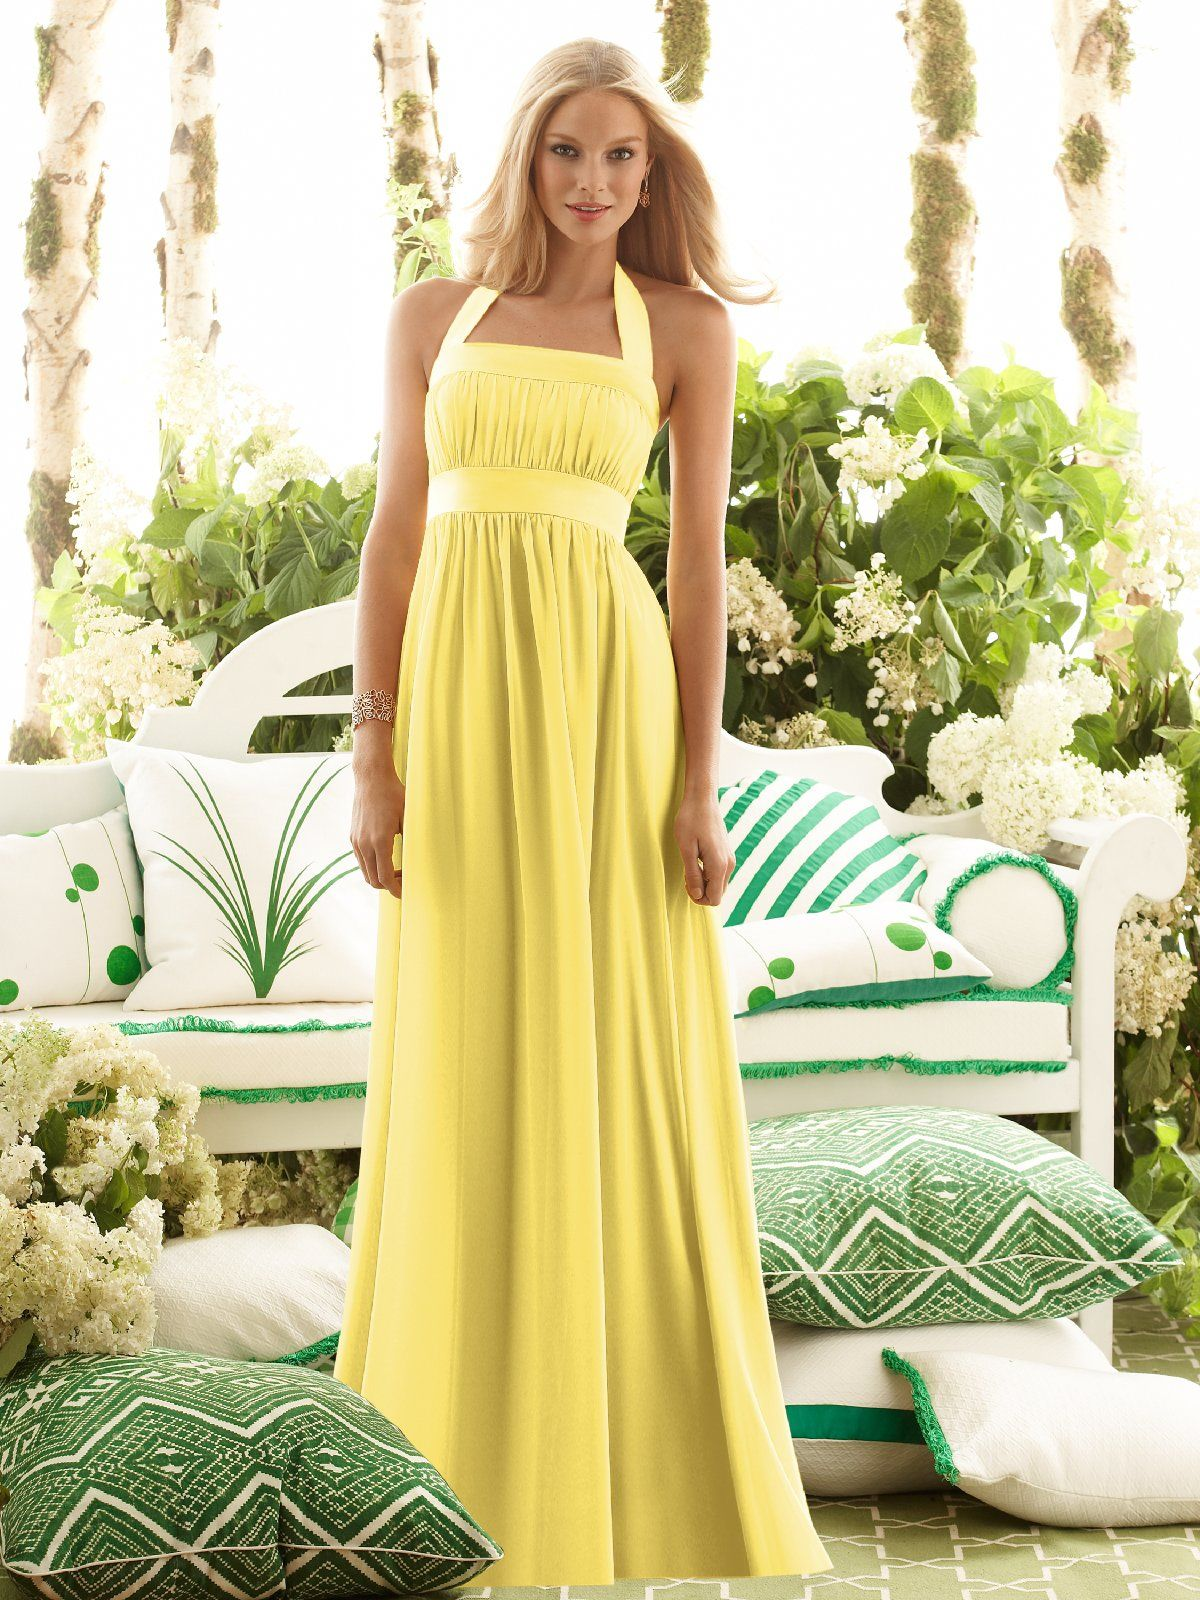 Long yellow dress color splash for summer days stunning dresses